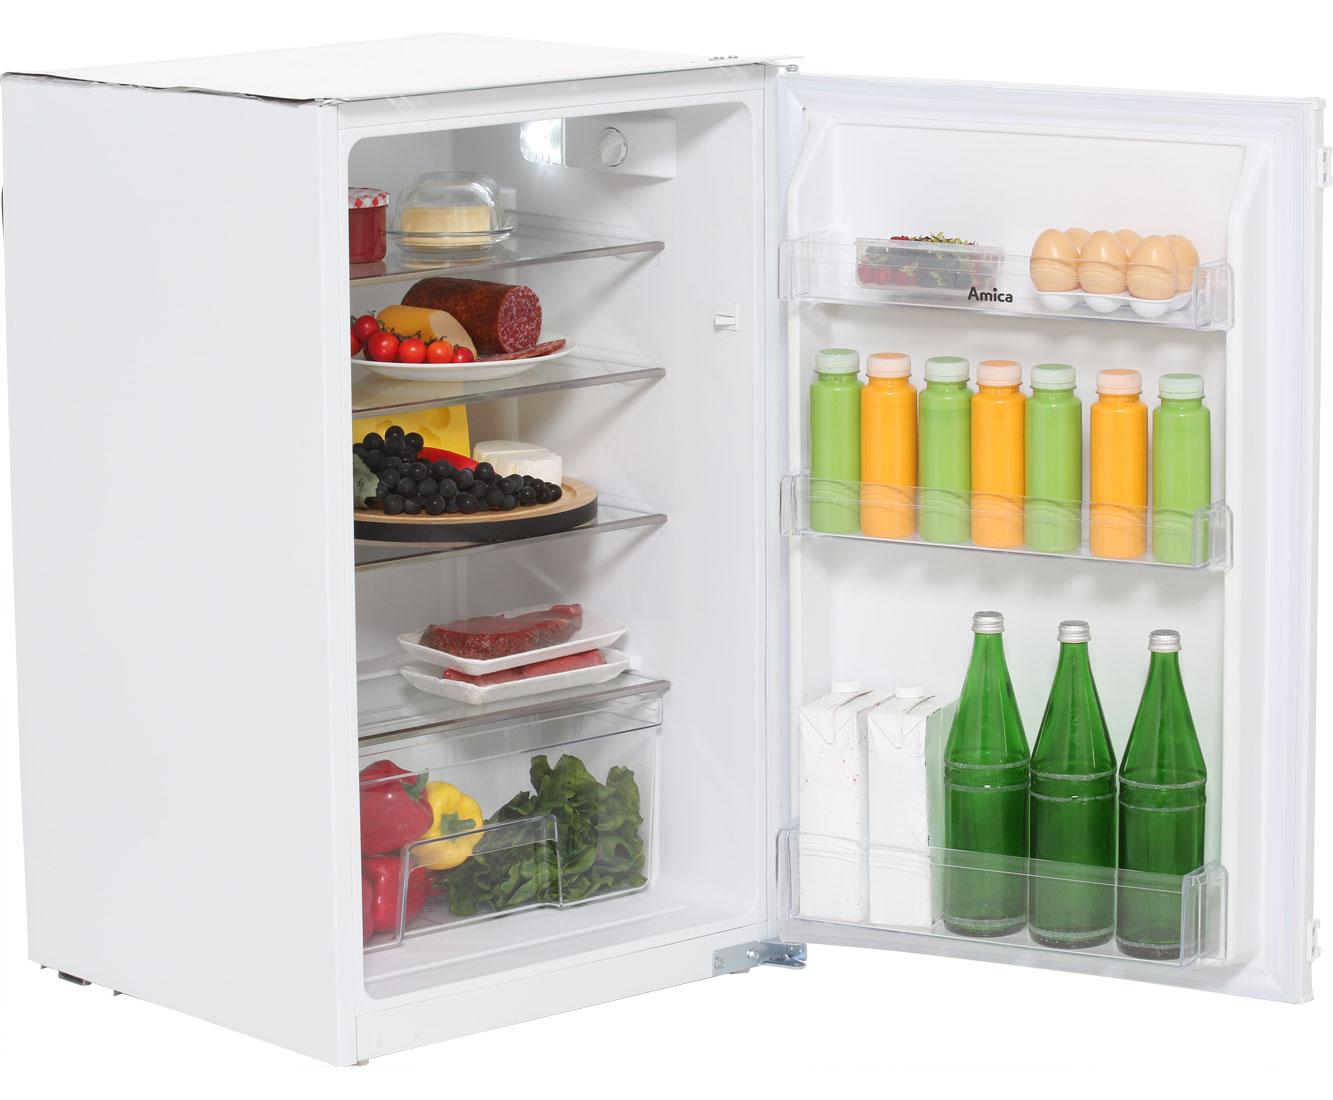 Amica EVKS16172 Kühlschränke - Weiß